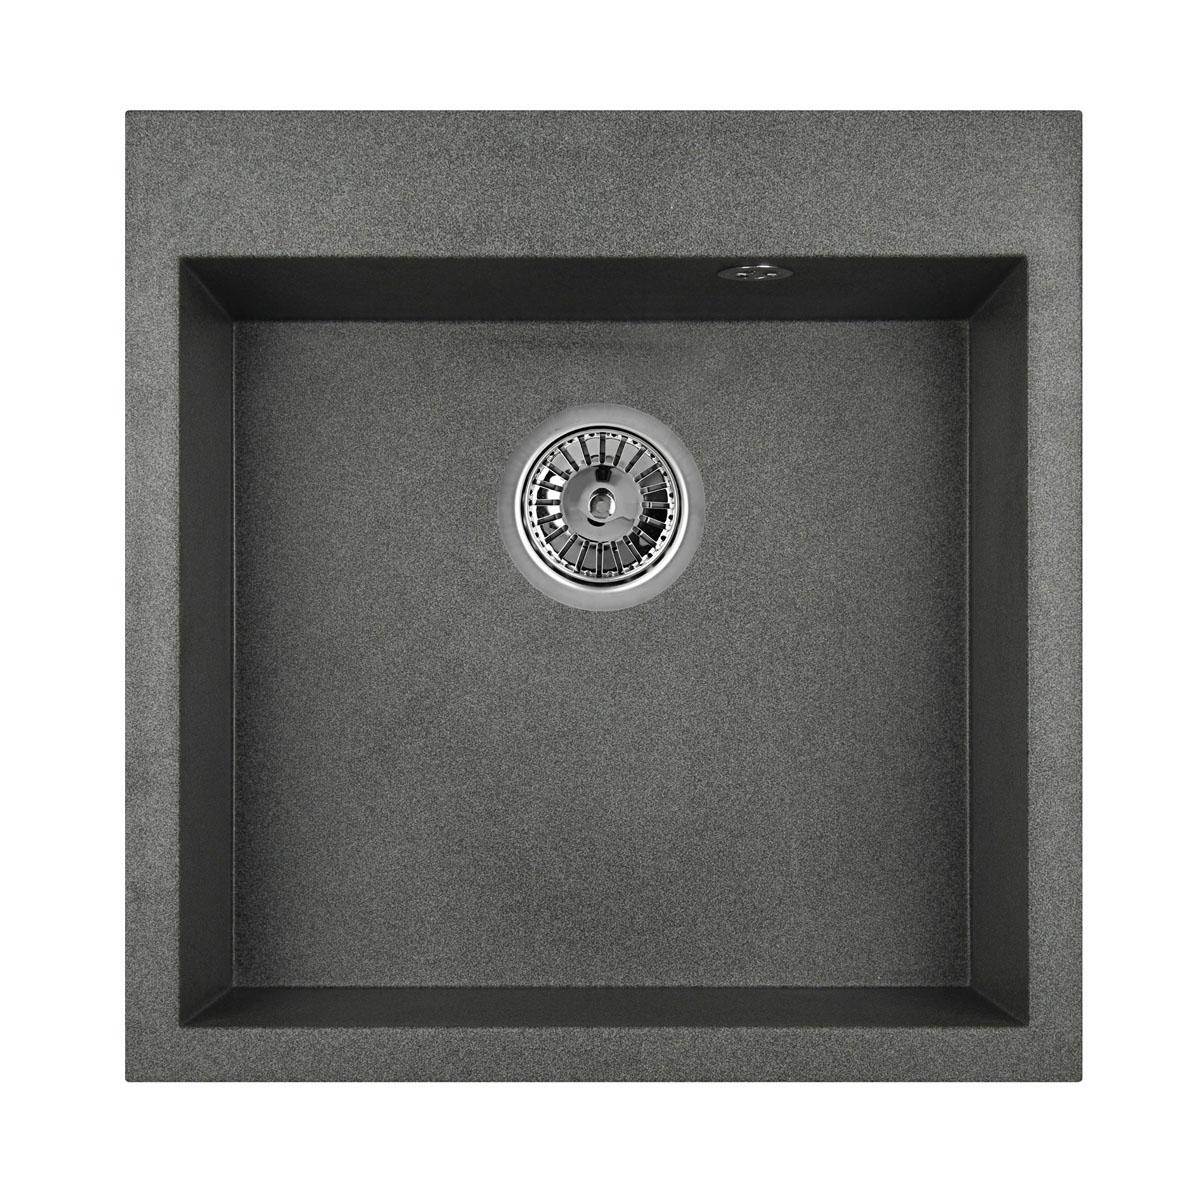 Кухонная мойка Granula GR-5102 505х510 графит weissgauff quadro 505 eco granit графит